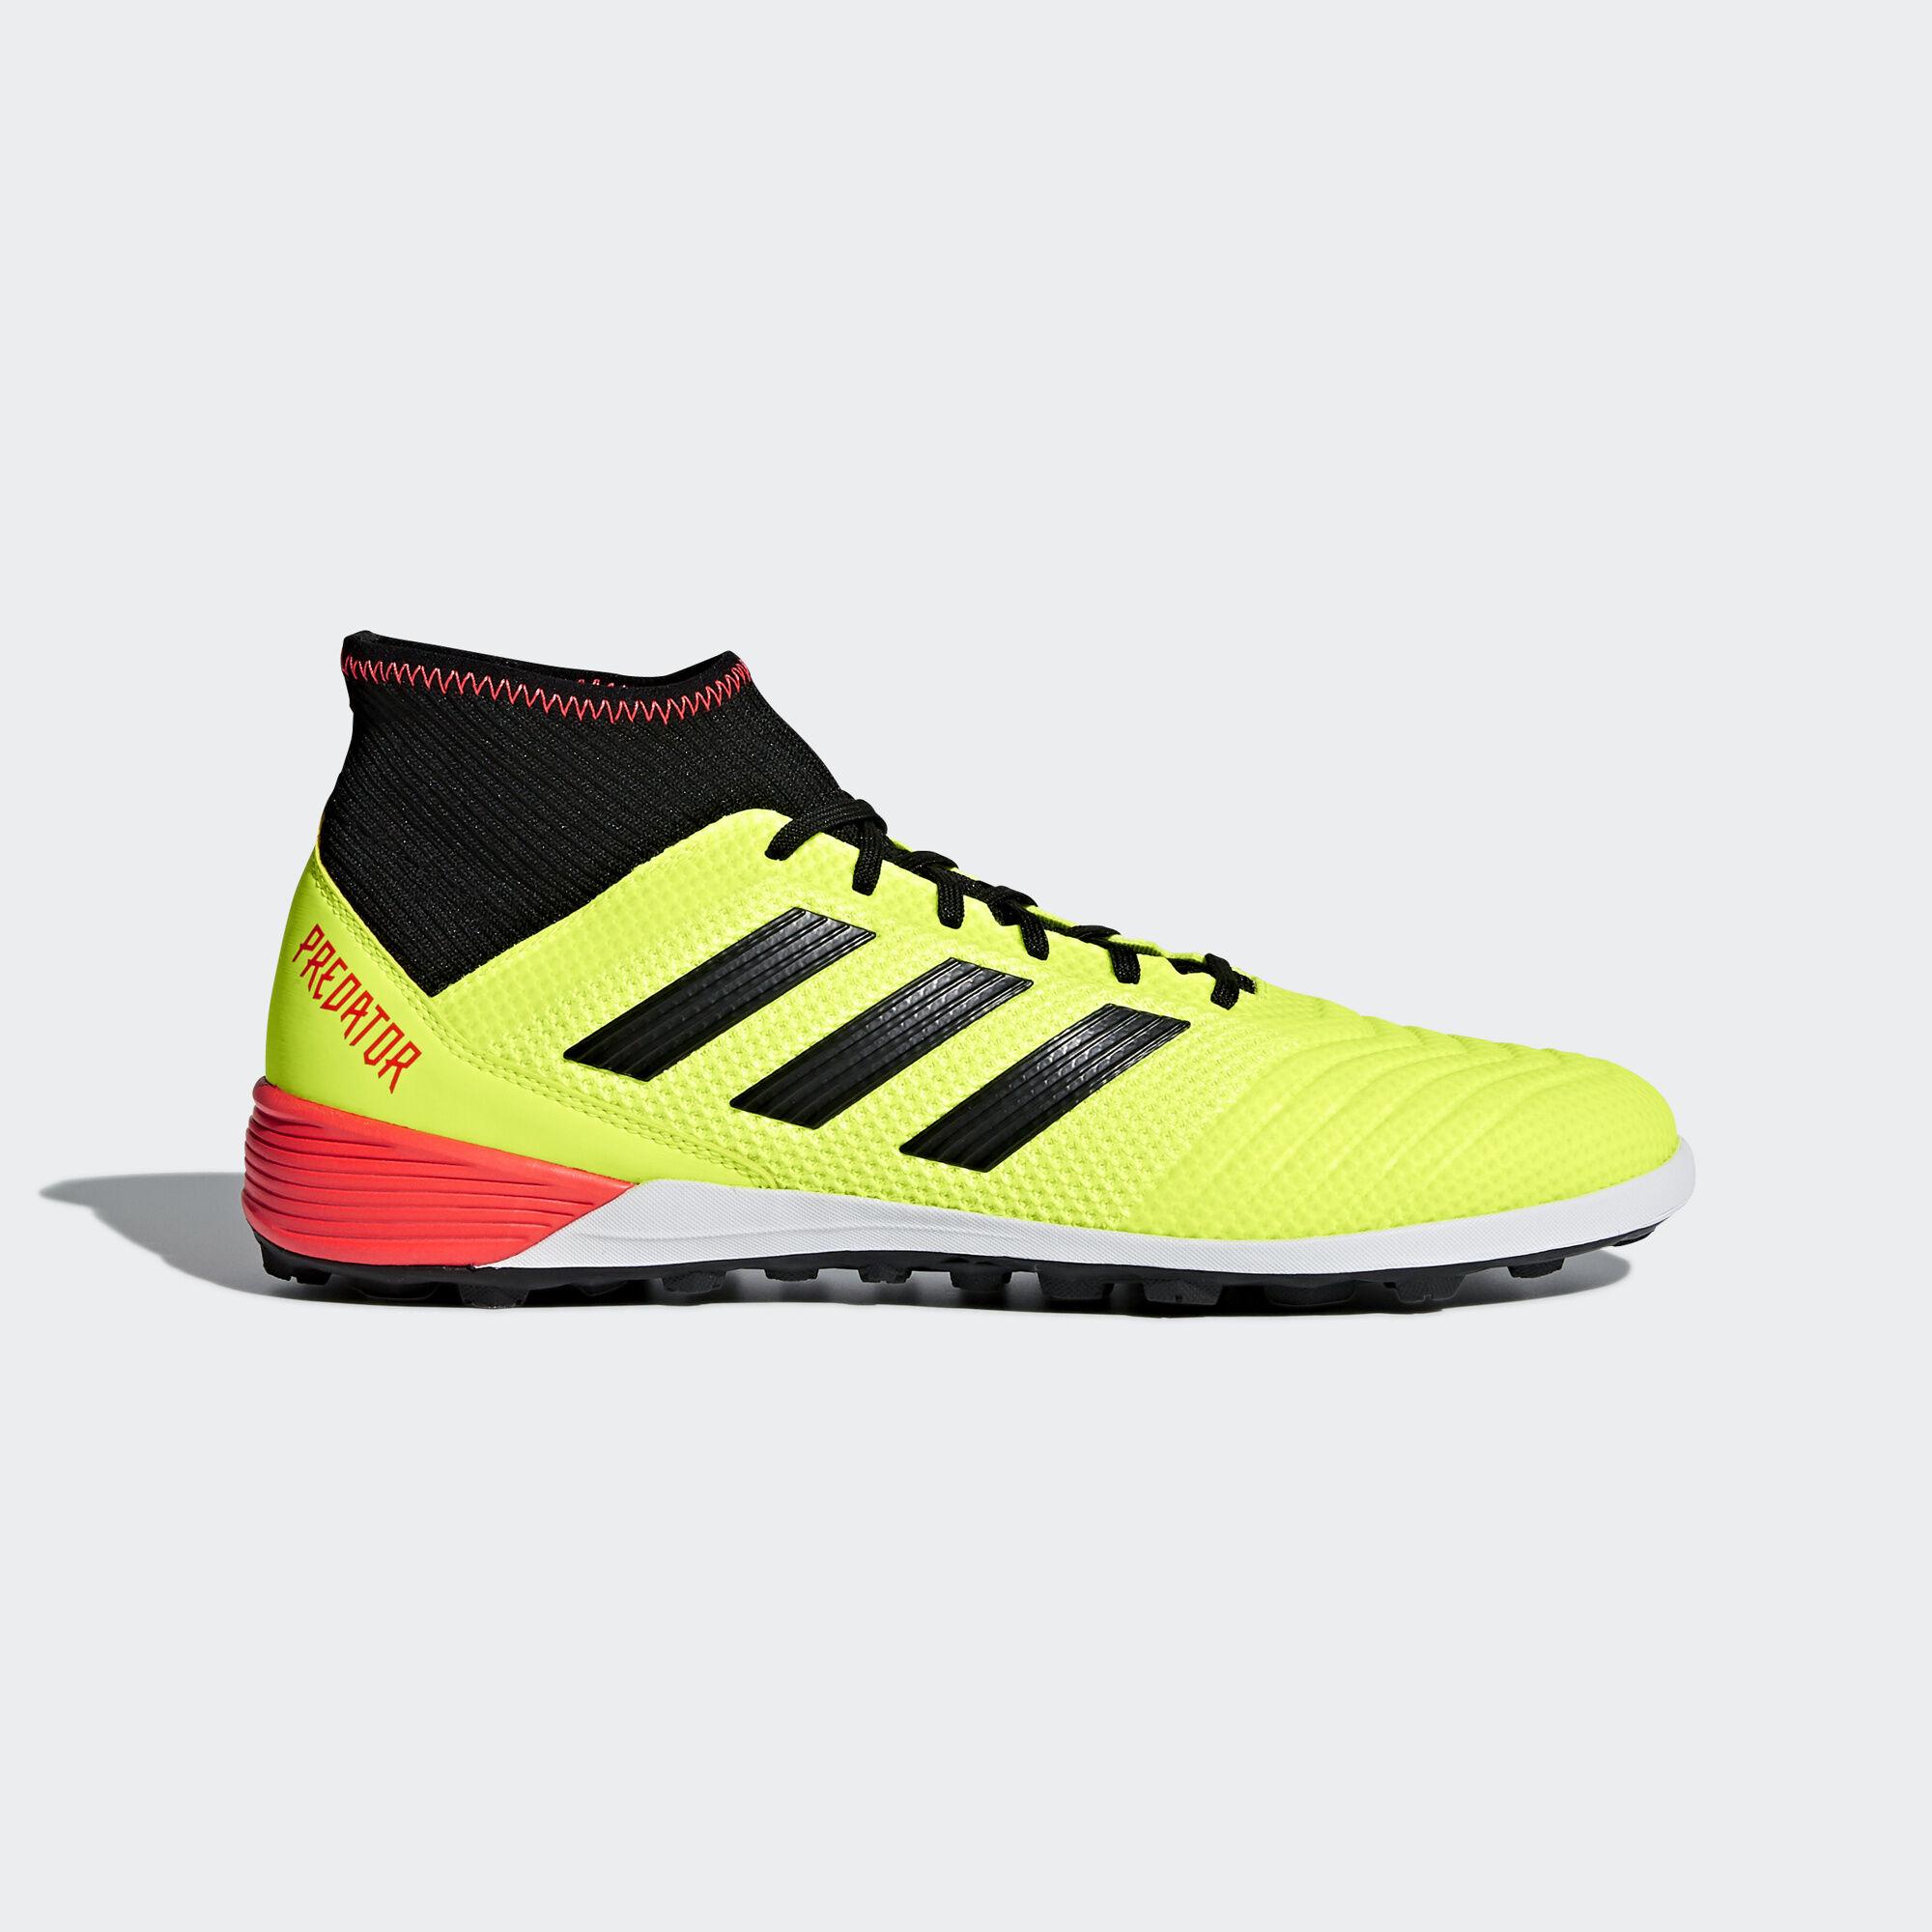 adidas - Predator Tango 18.3 Turf Boots Solar Yellow   Core Black   Solar  Red DB2134. Men Football c896165af1d